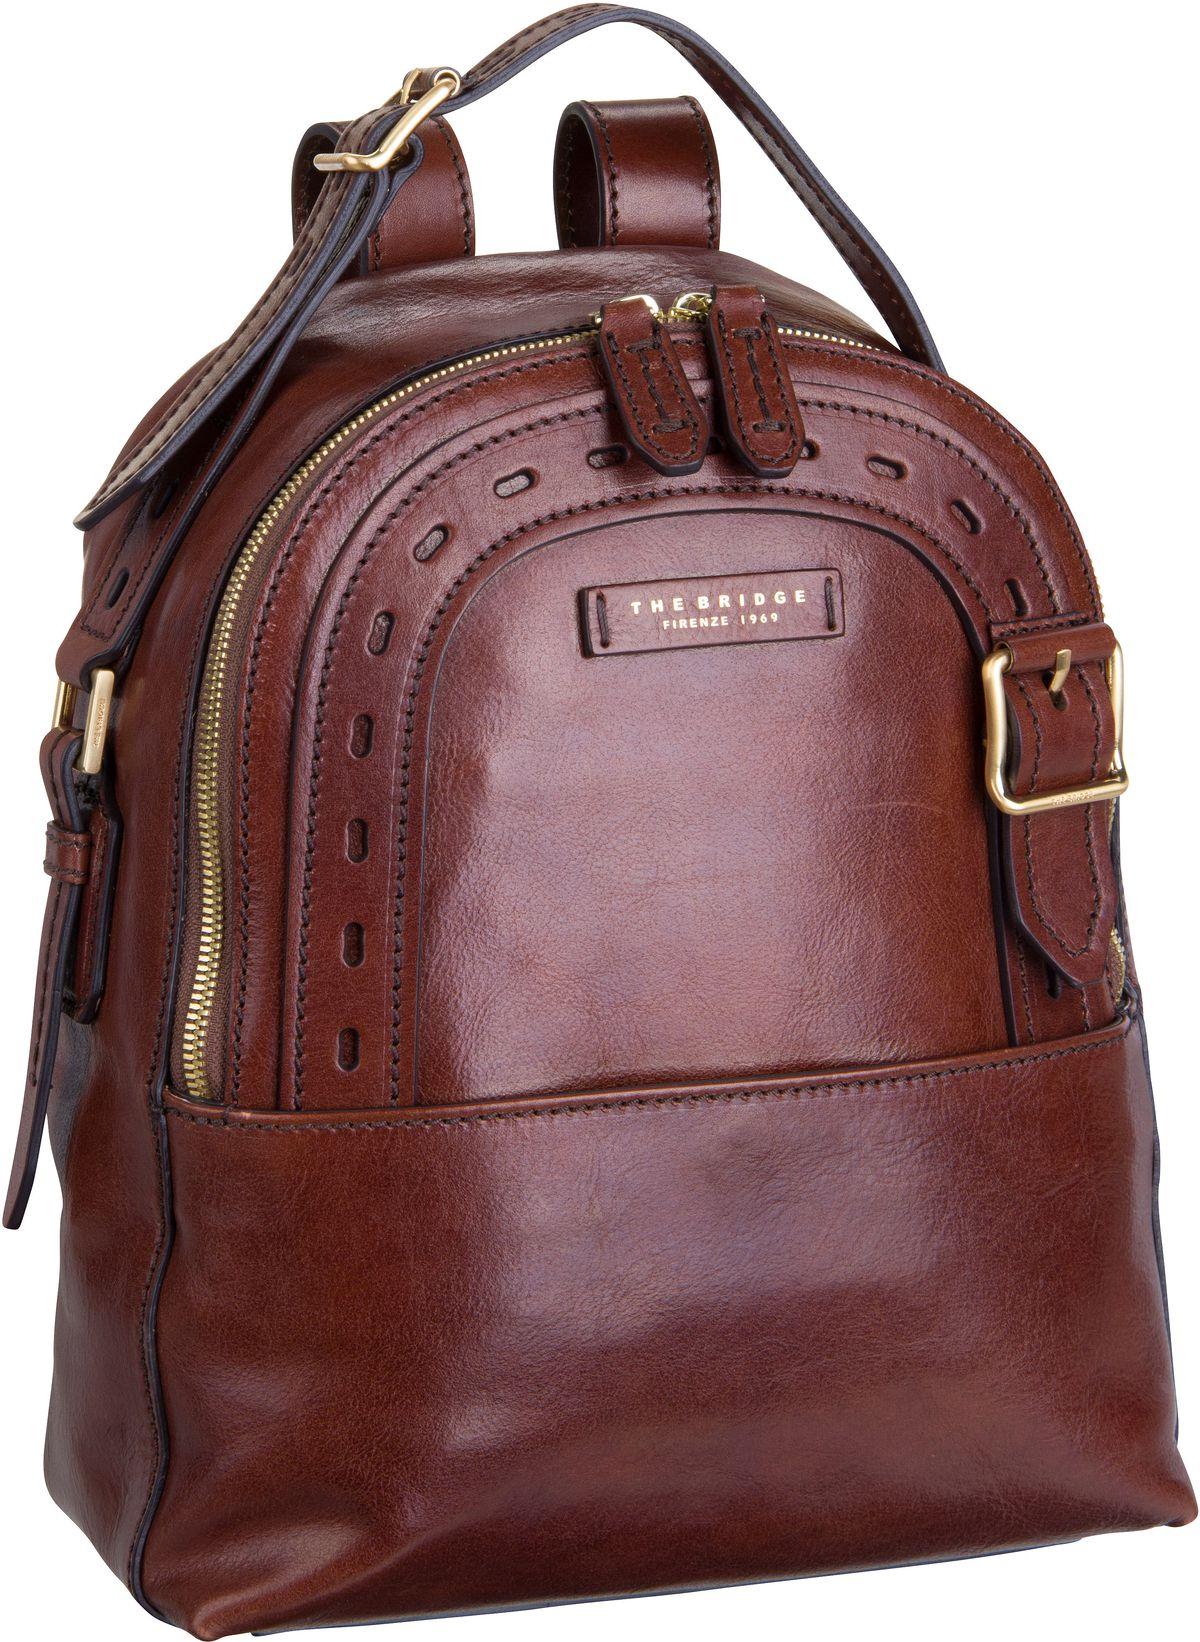 Rucksack / Daypack Calimala Rucksack 4539 Marrone